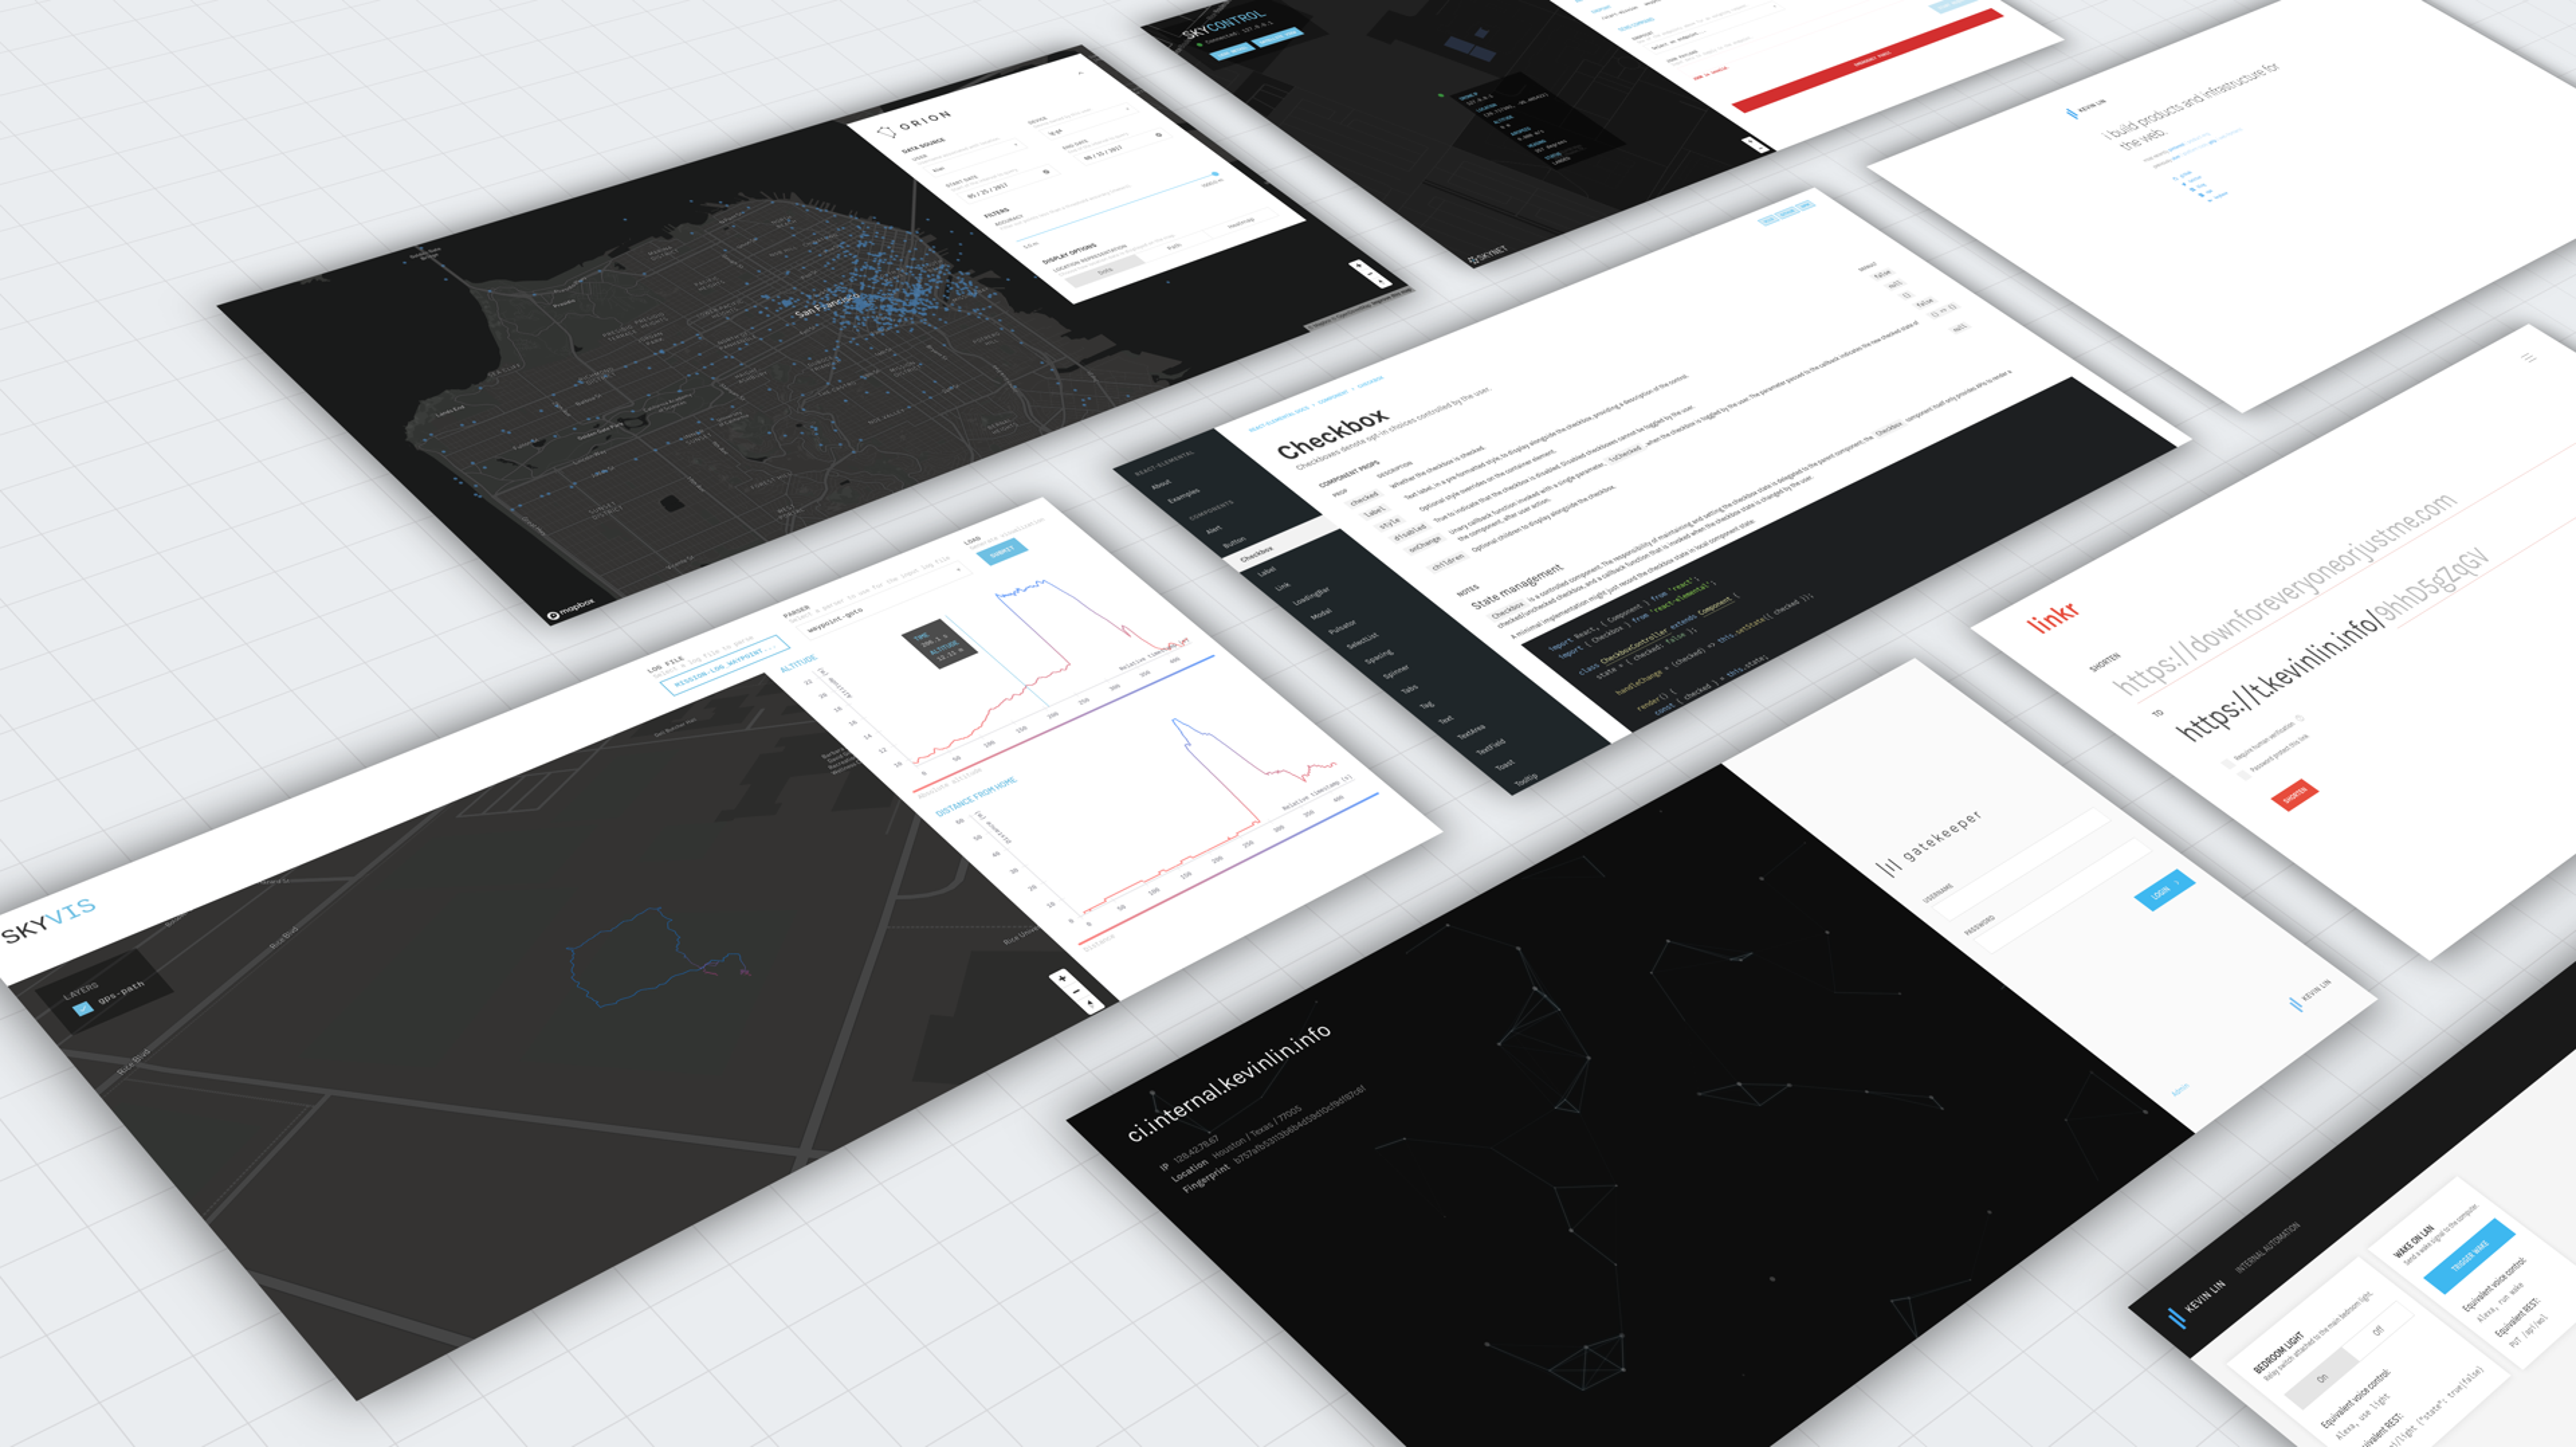 React Elemental: A Modern, Flat React UI Component Library